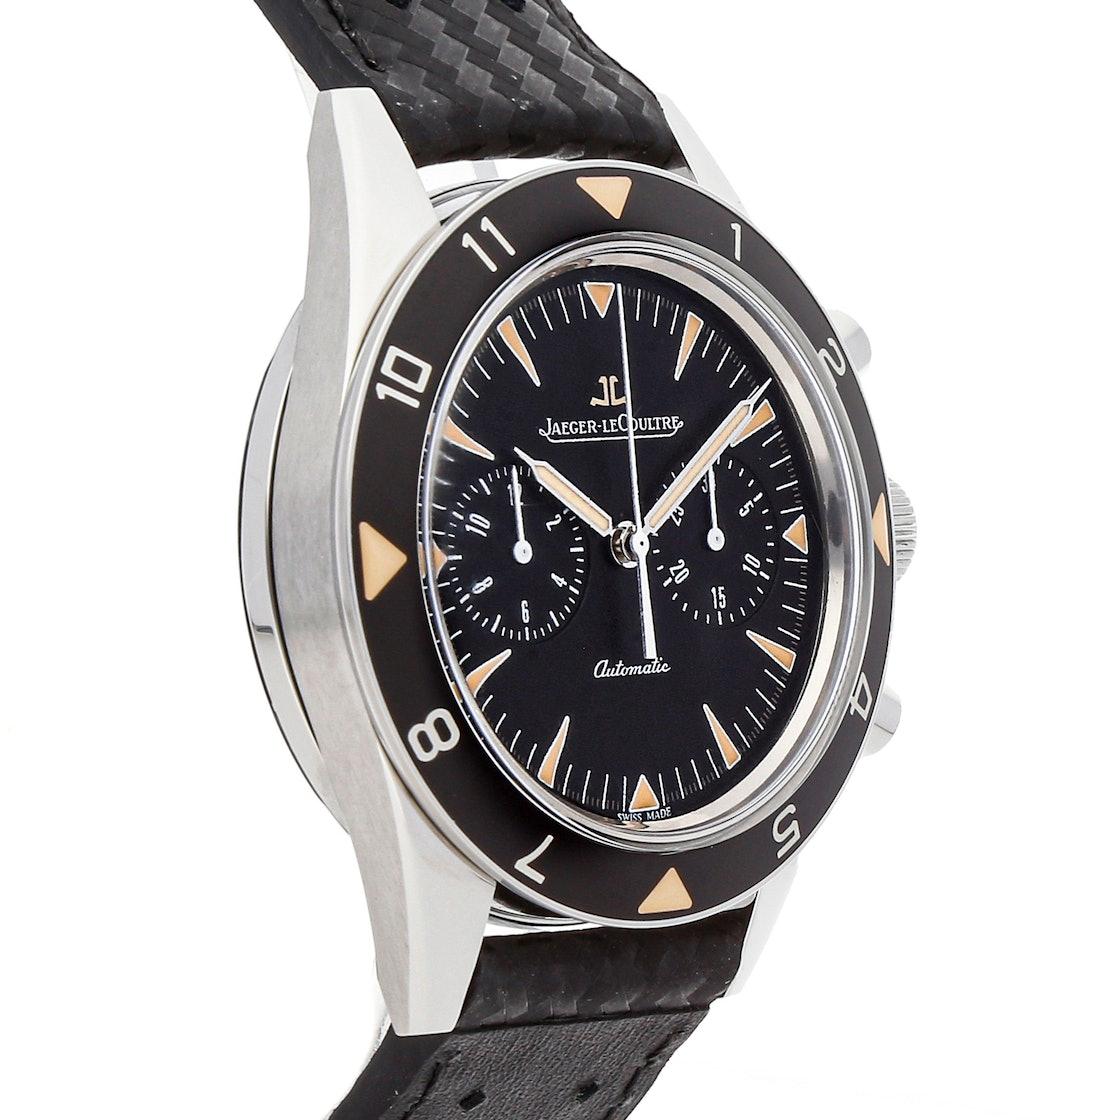 Jaeger-LeCoultre Deep Sea Master Compressor Chronograph Special Edition Q207857J